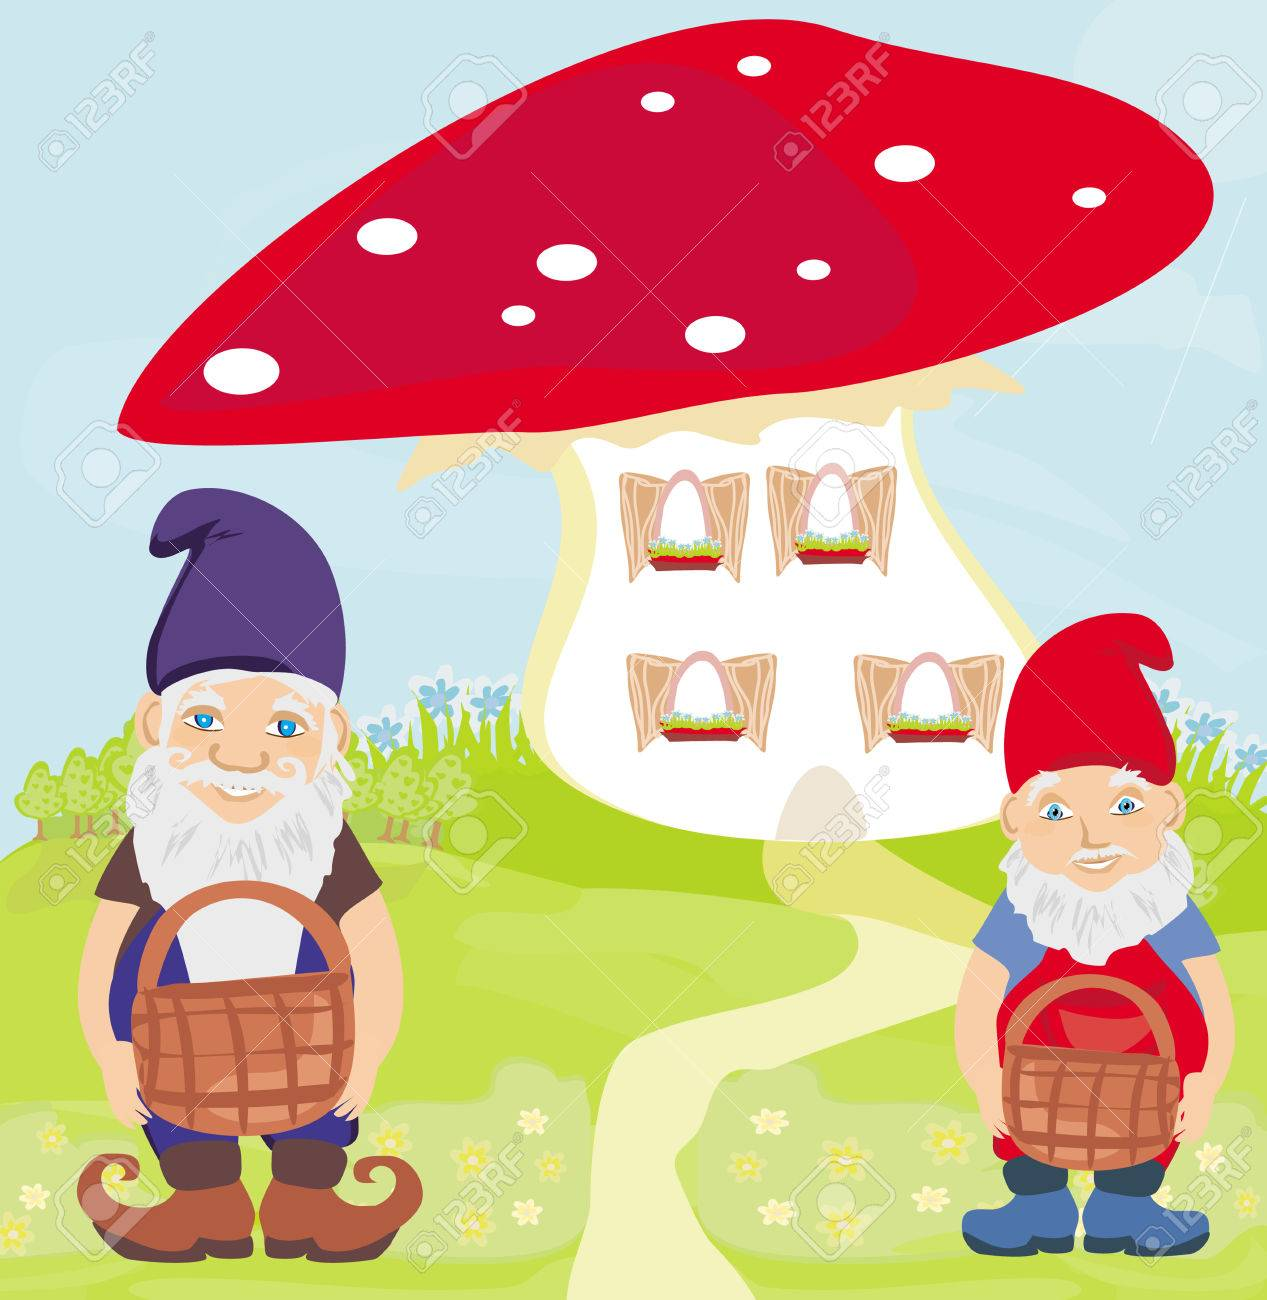 funny cartoon mushroom house and two funny gnomes royalty free